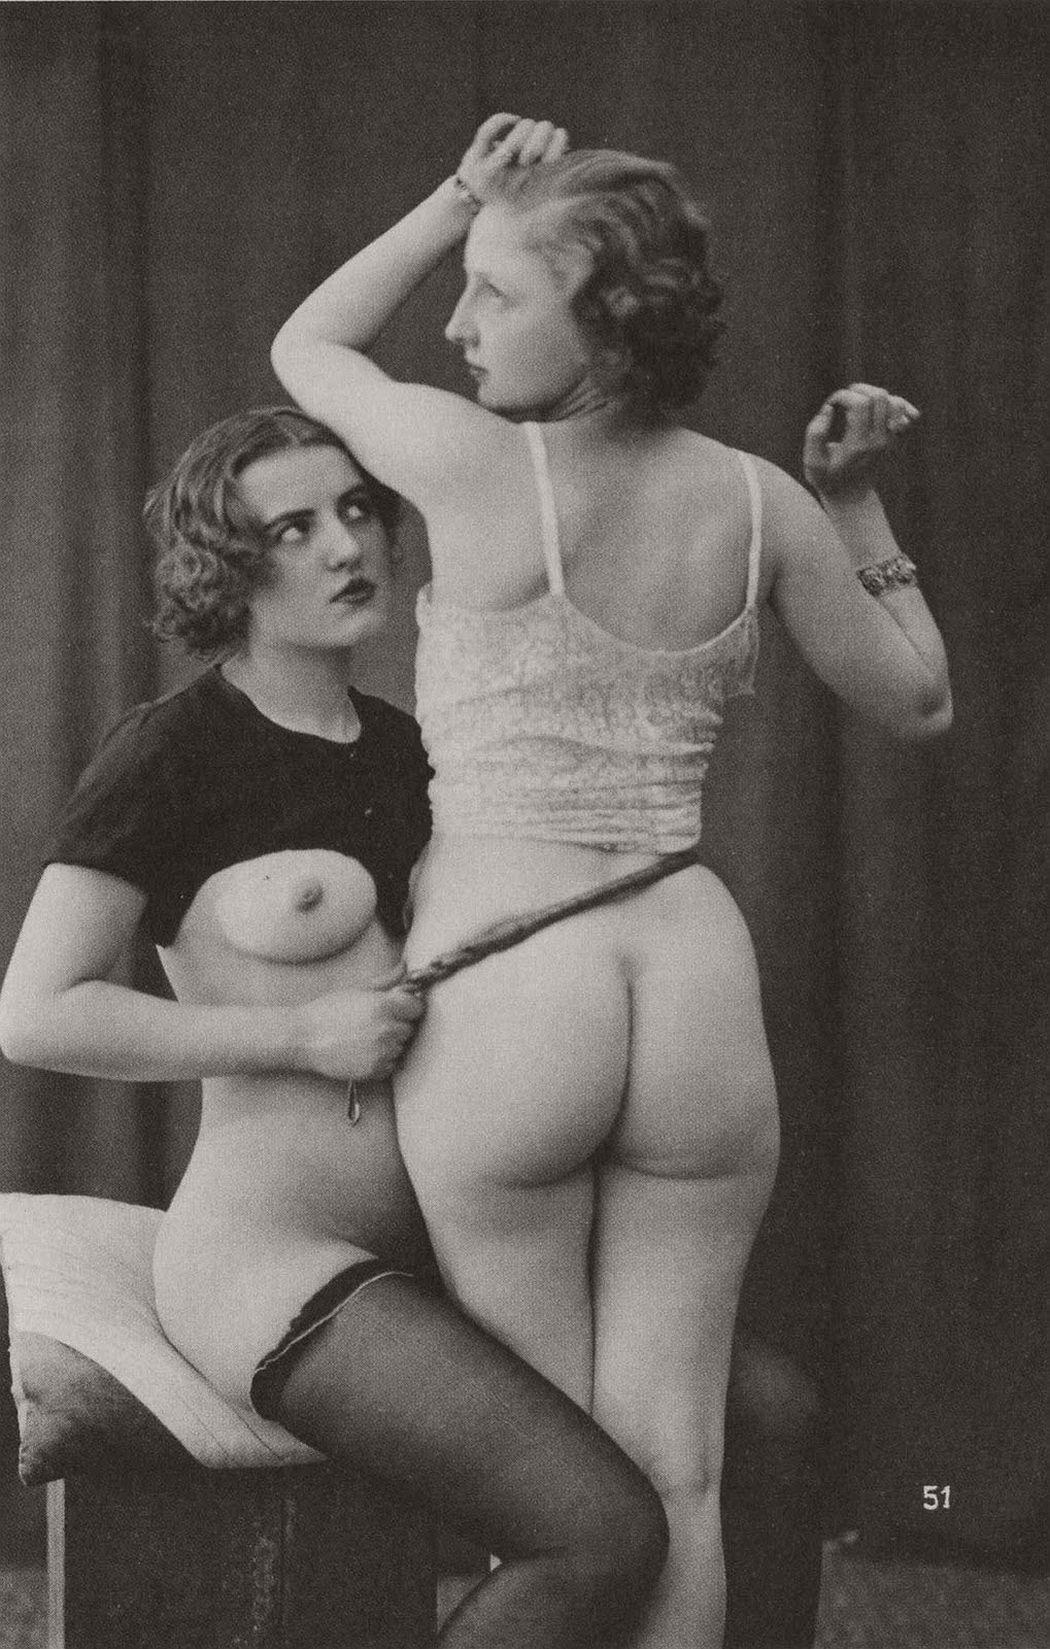 pinnukin fop on Вінтажна еротика | pinterest | vintage lesbian